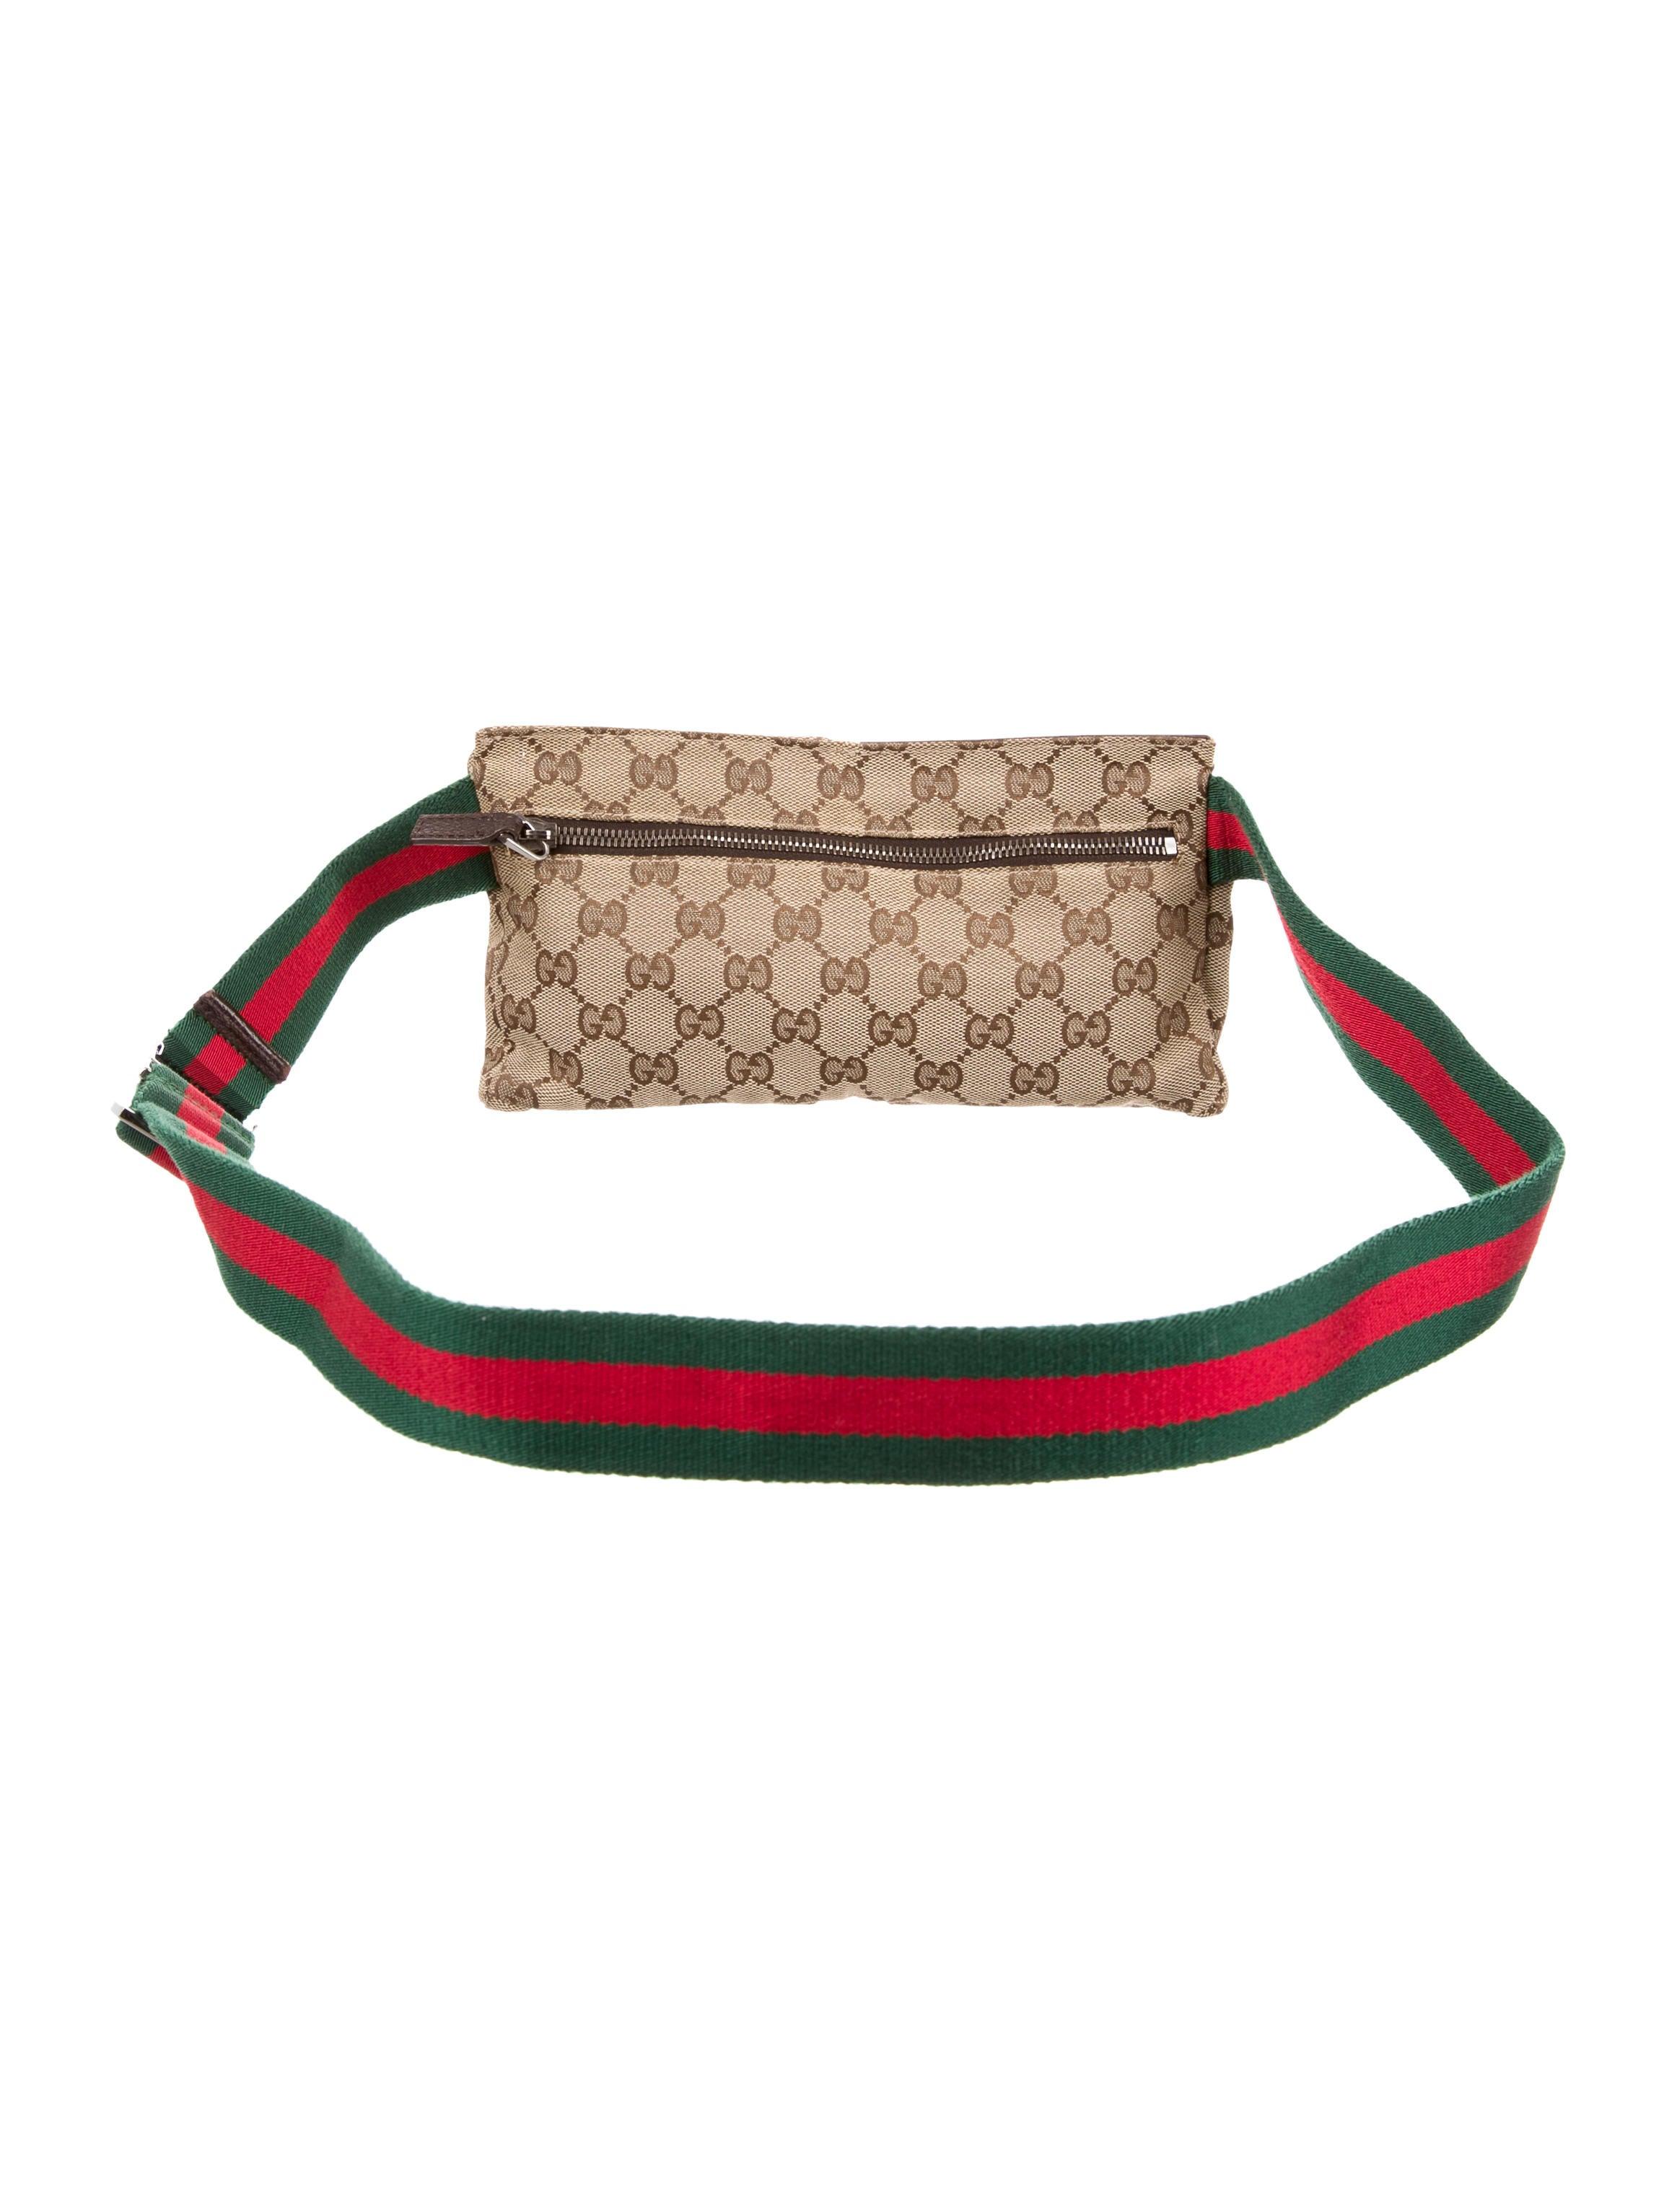 c1191aafdb3fd8 Gucci Belt Bag The Real Real - Ontario Active School Travel